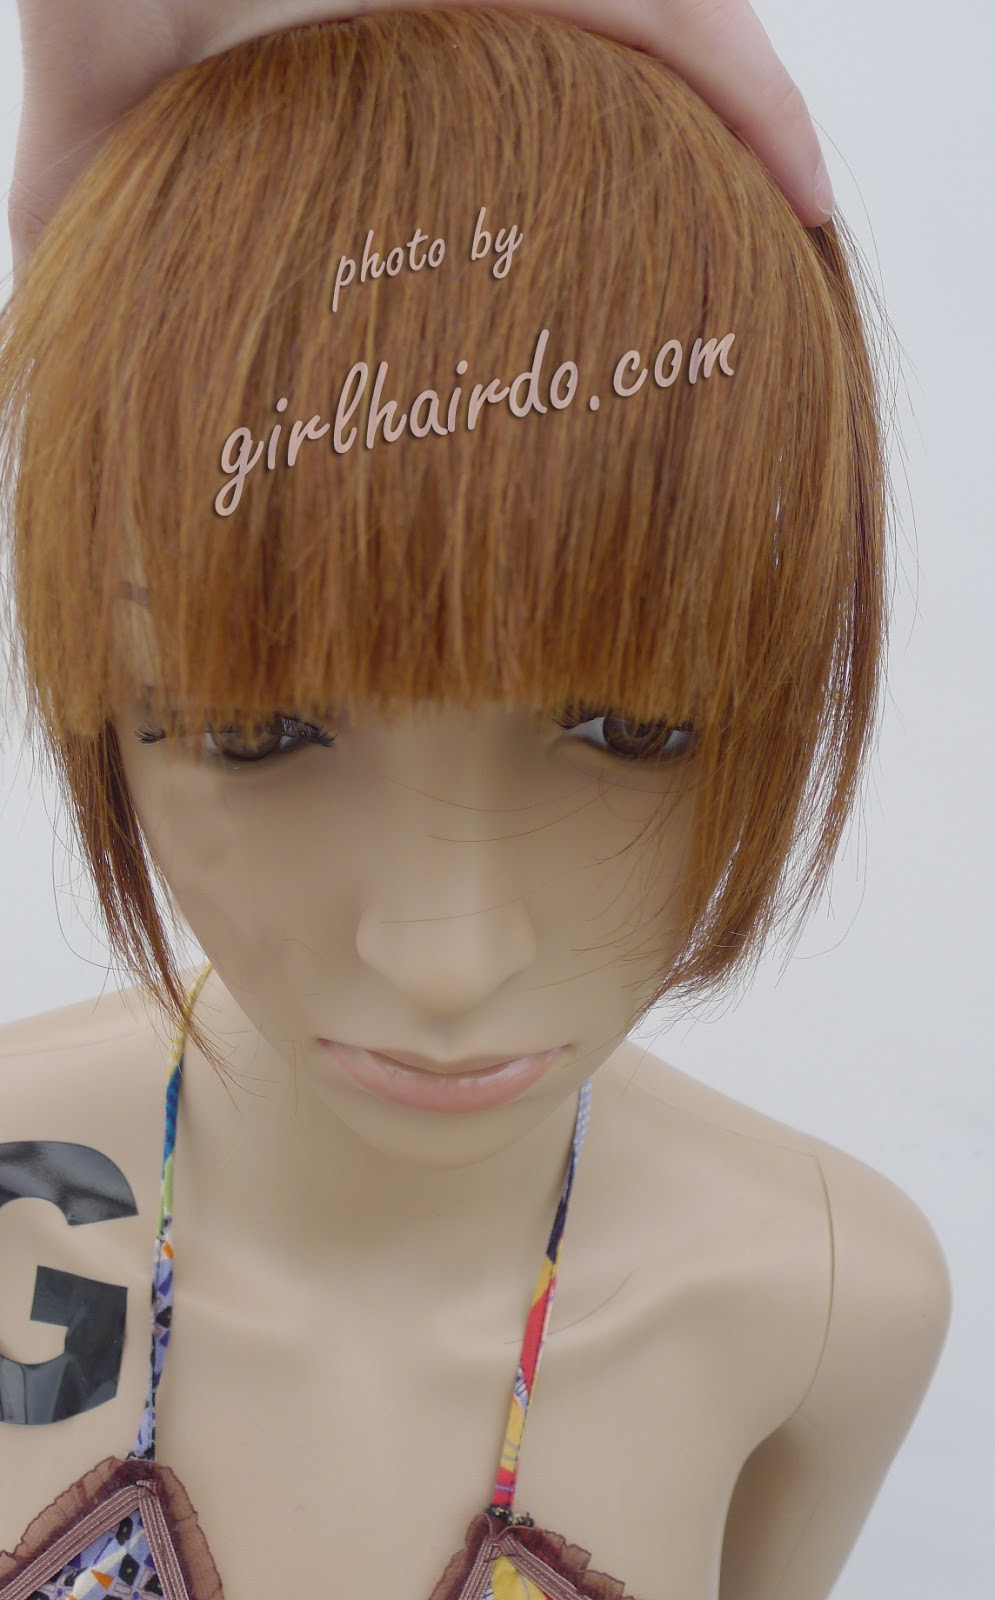 http://2.bp.blogspot.com/-qdT5GKIcuDo/UOxAFPeAvSI/AAAAAAAAHu8/McHStgH6u4U/s1600/069.JPG